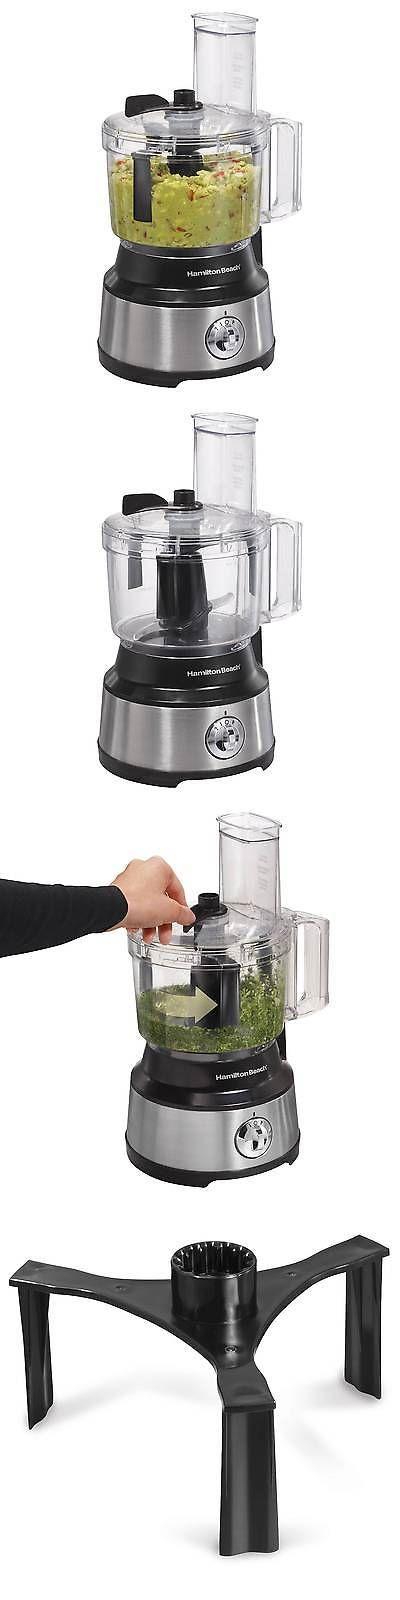 Small Kitchen Appliances: Hamilton Beach Bowl Scraper 10 Cup Food Processor - Black 70730 -> BUY IT NOW ONLY: $37.49 on eBay!